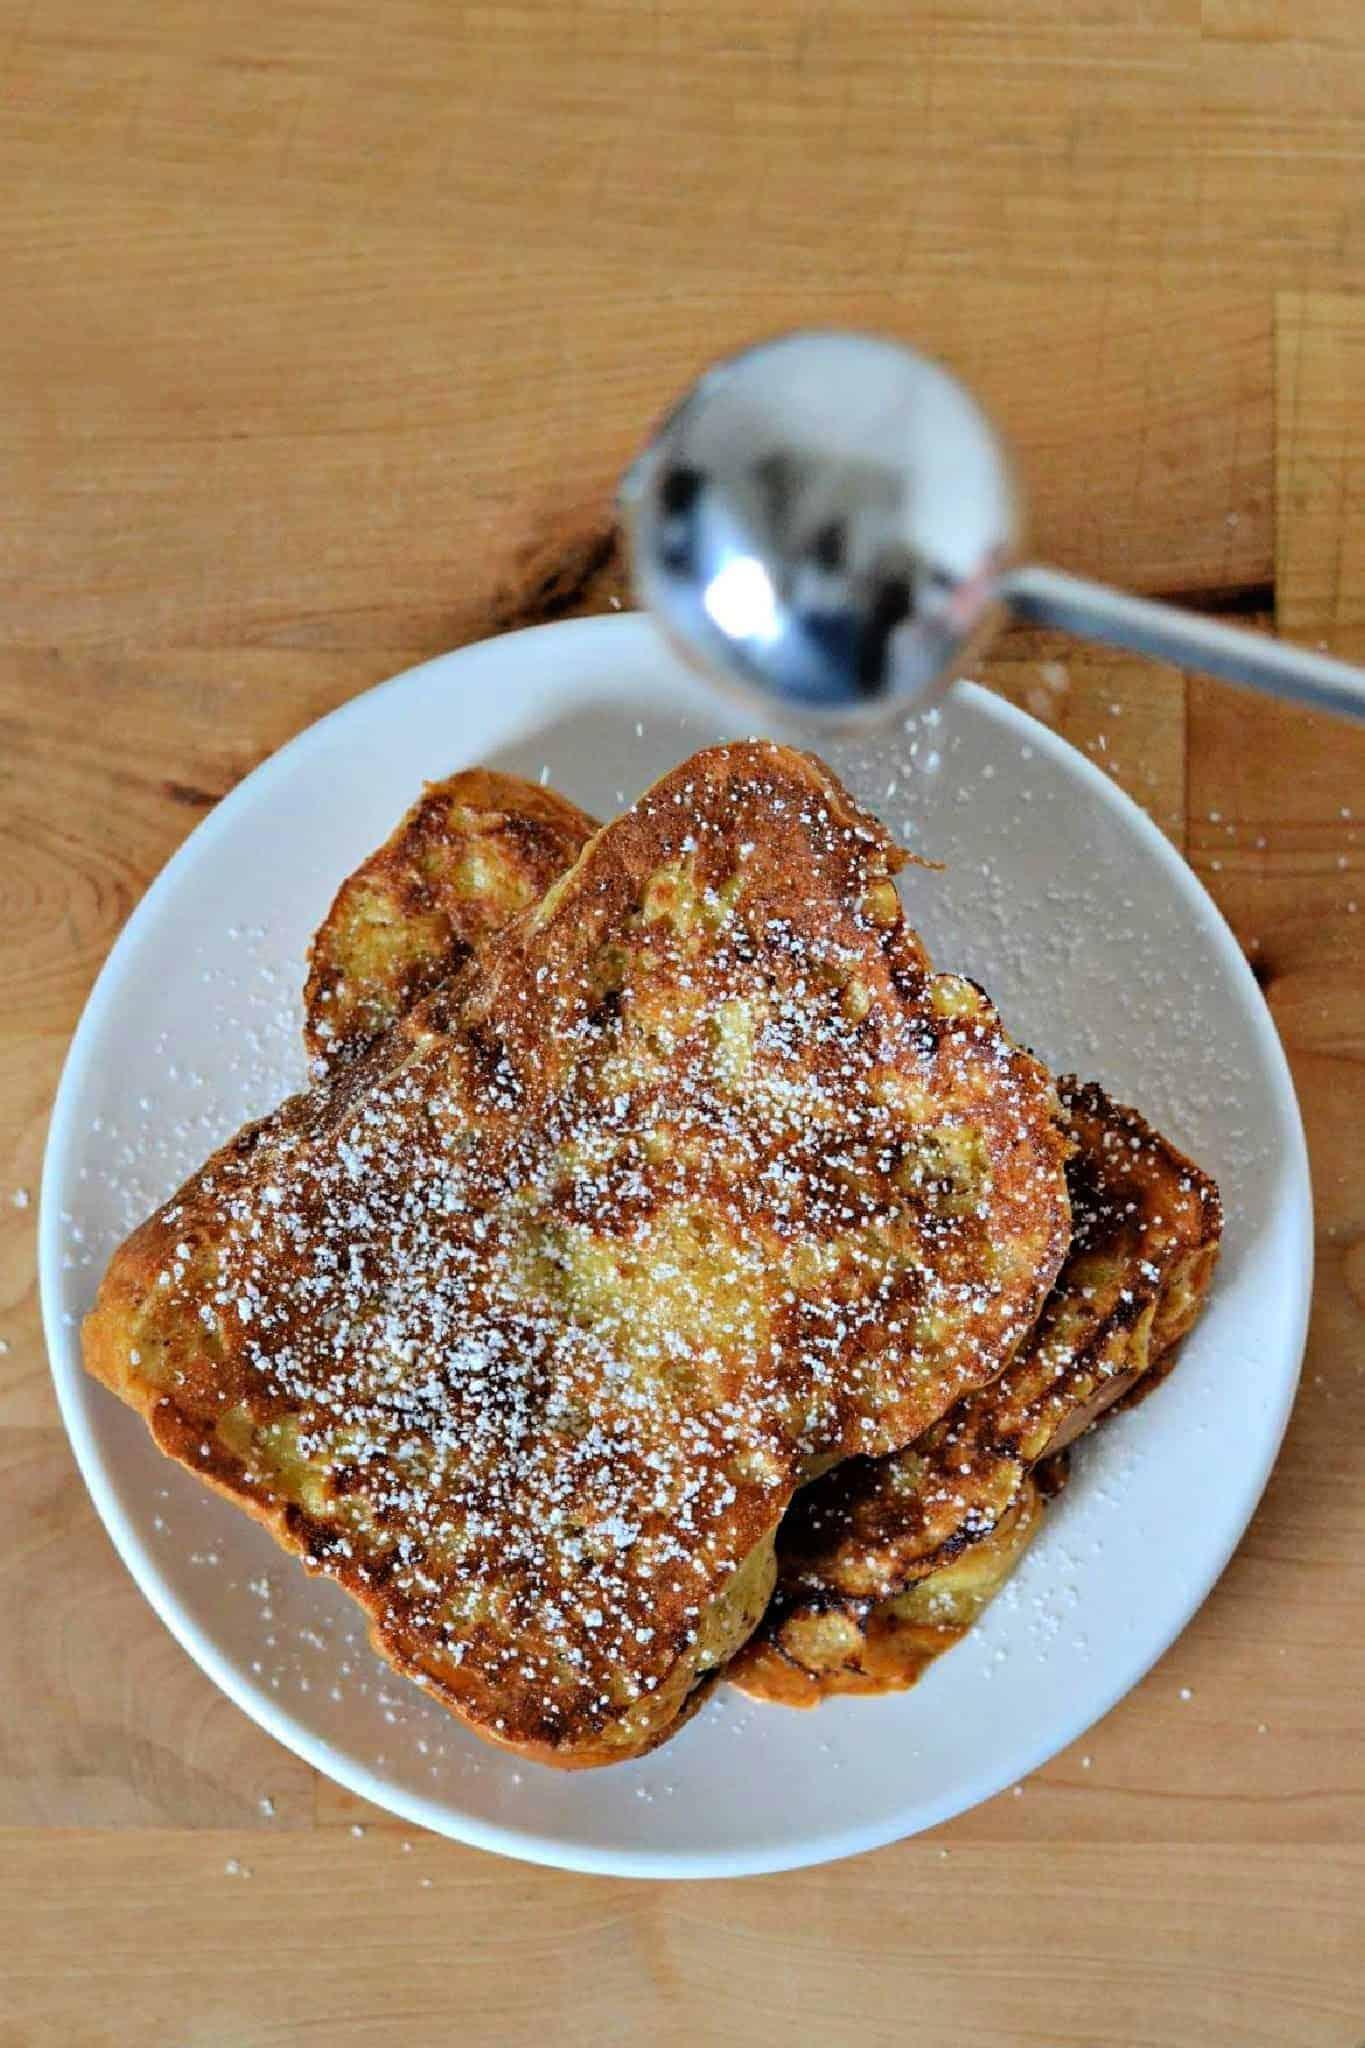 sprinkling powdered sugar on French toast